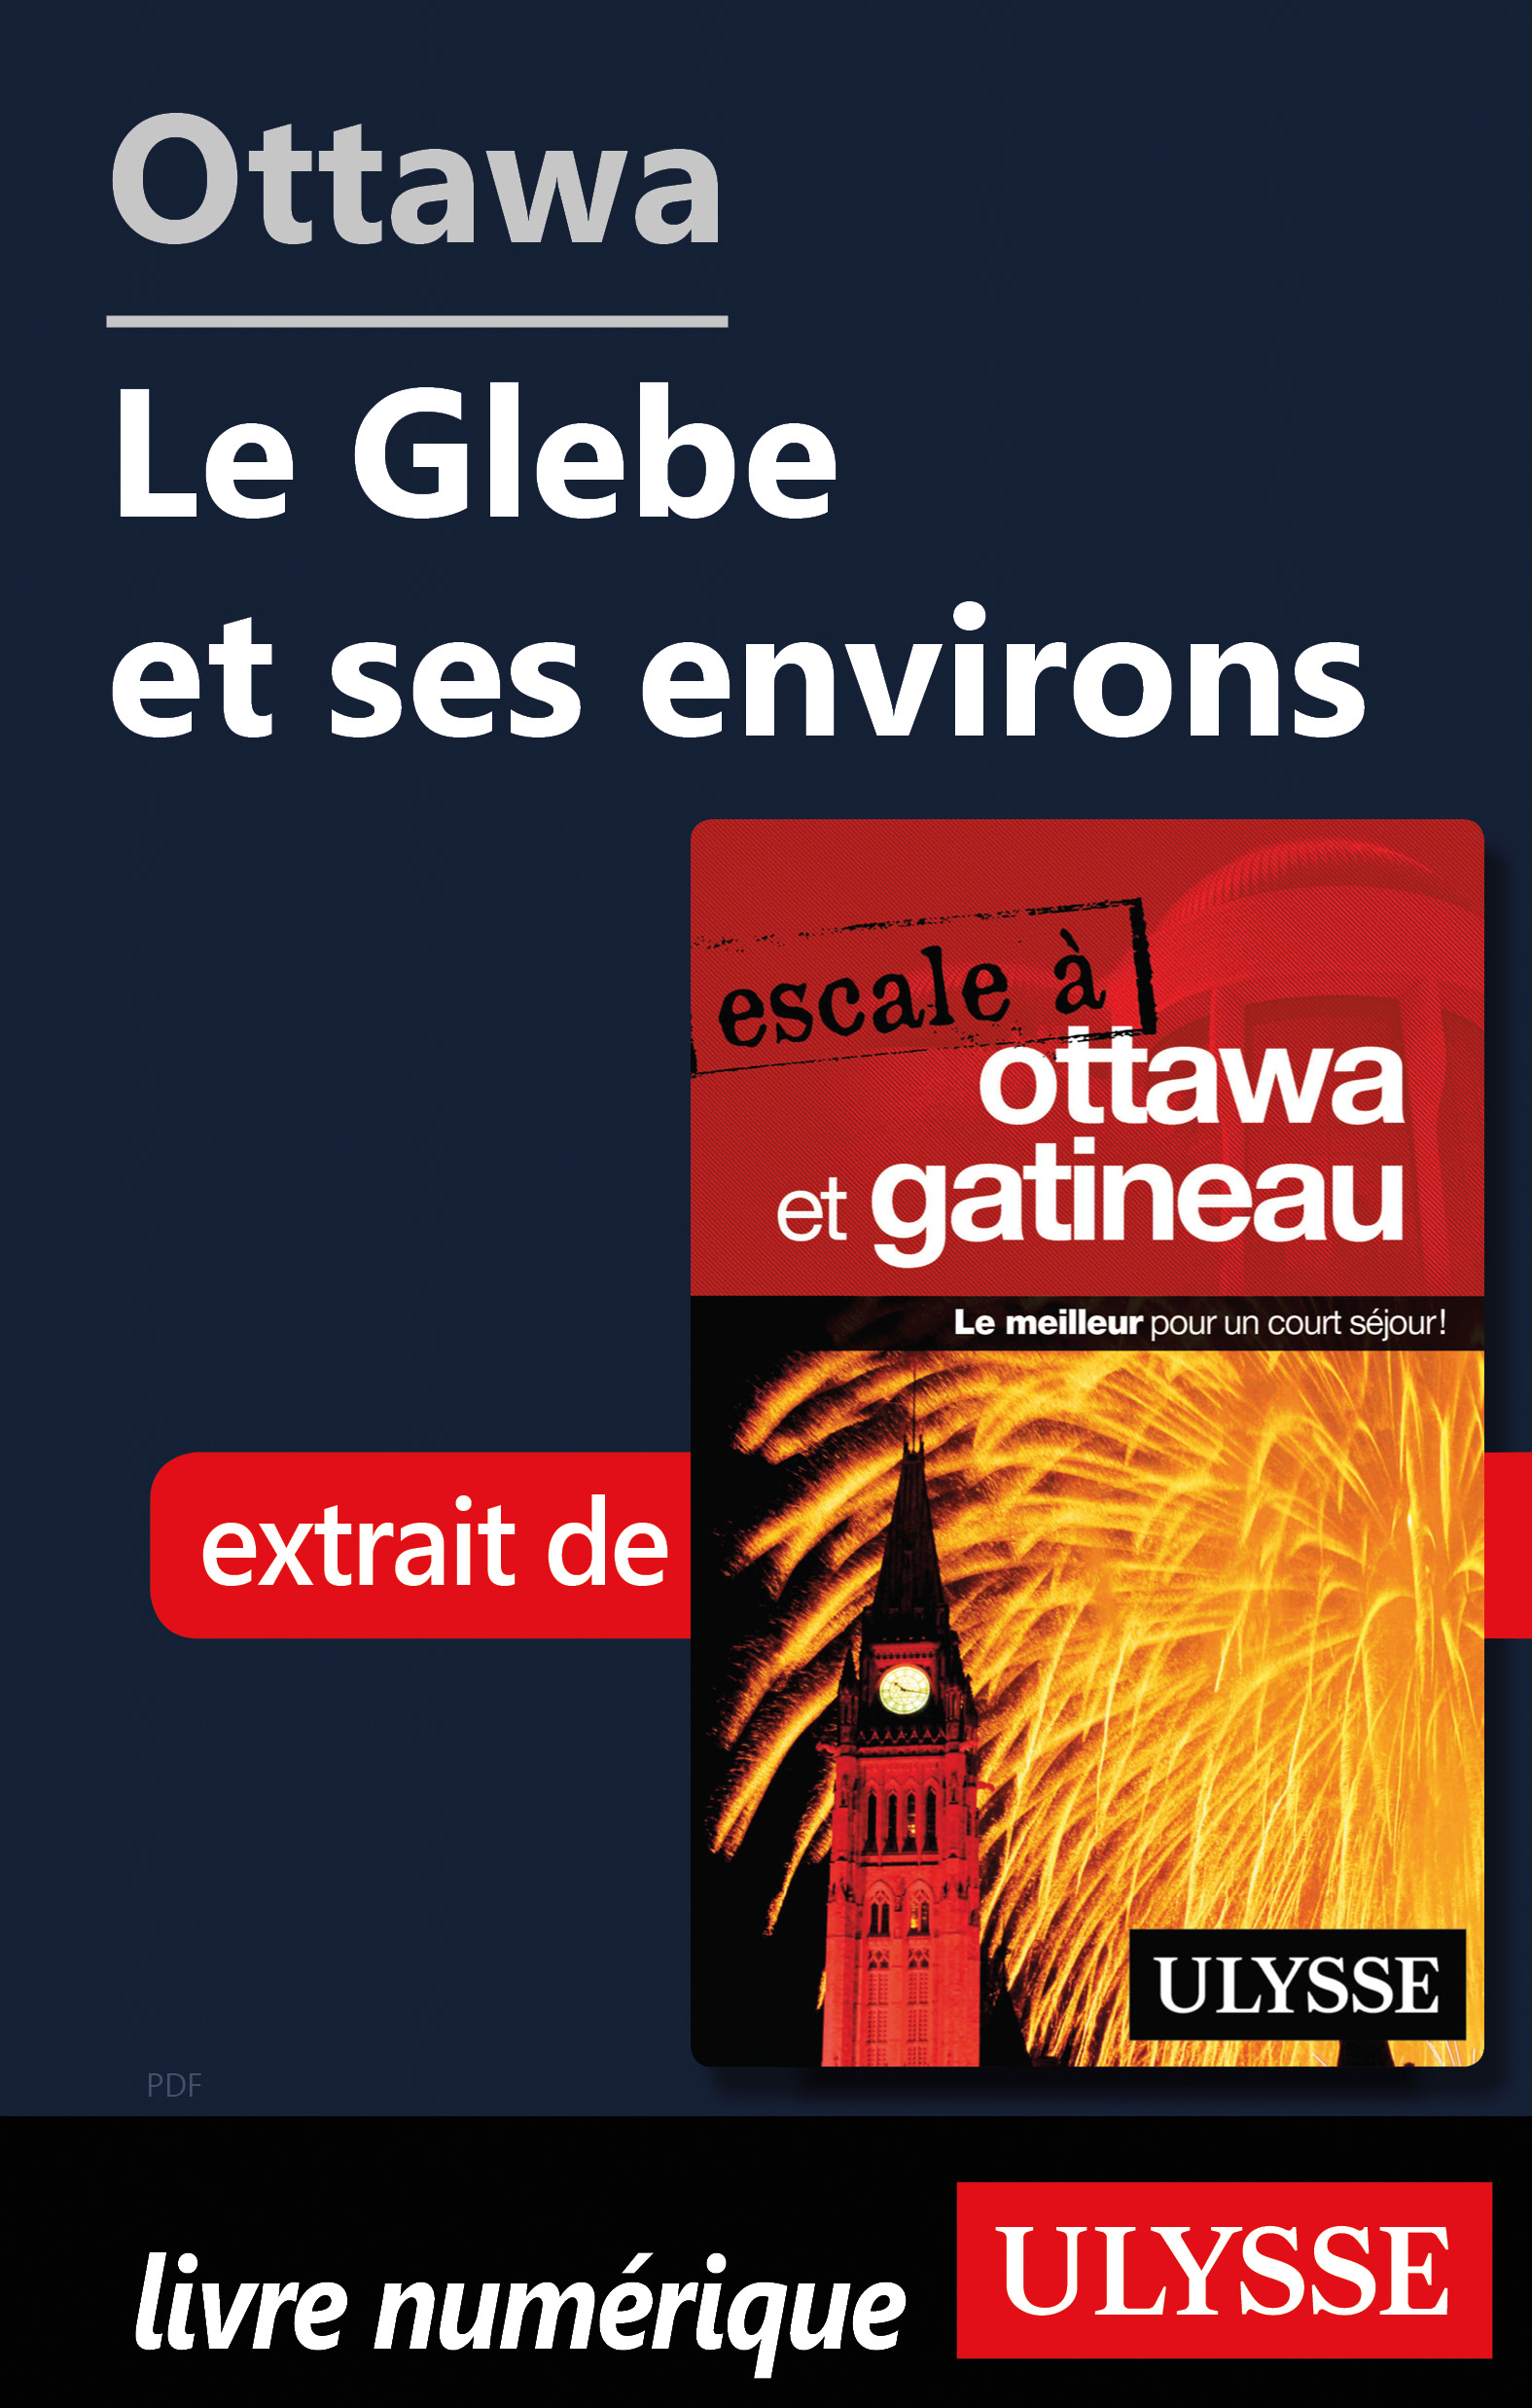 Ottawa: Le Glebe et ses environs